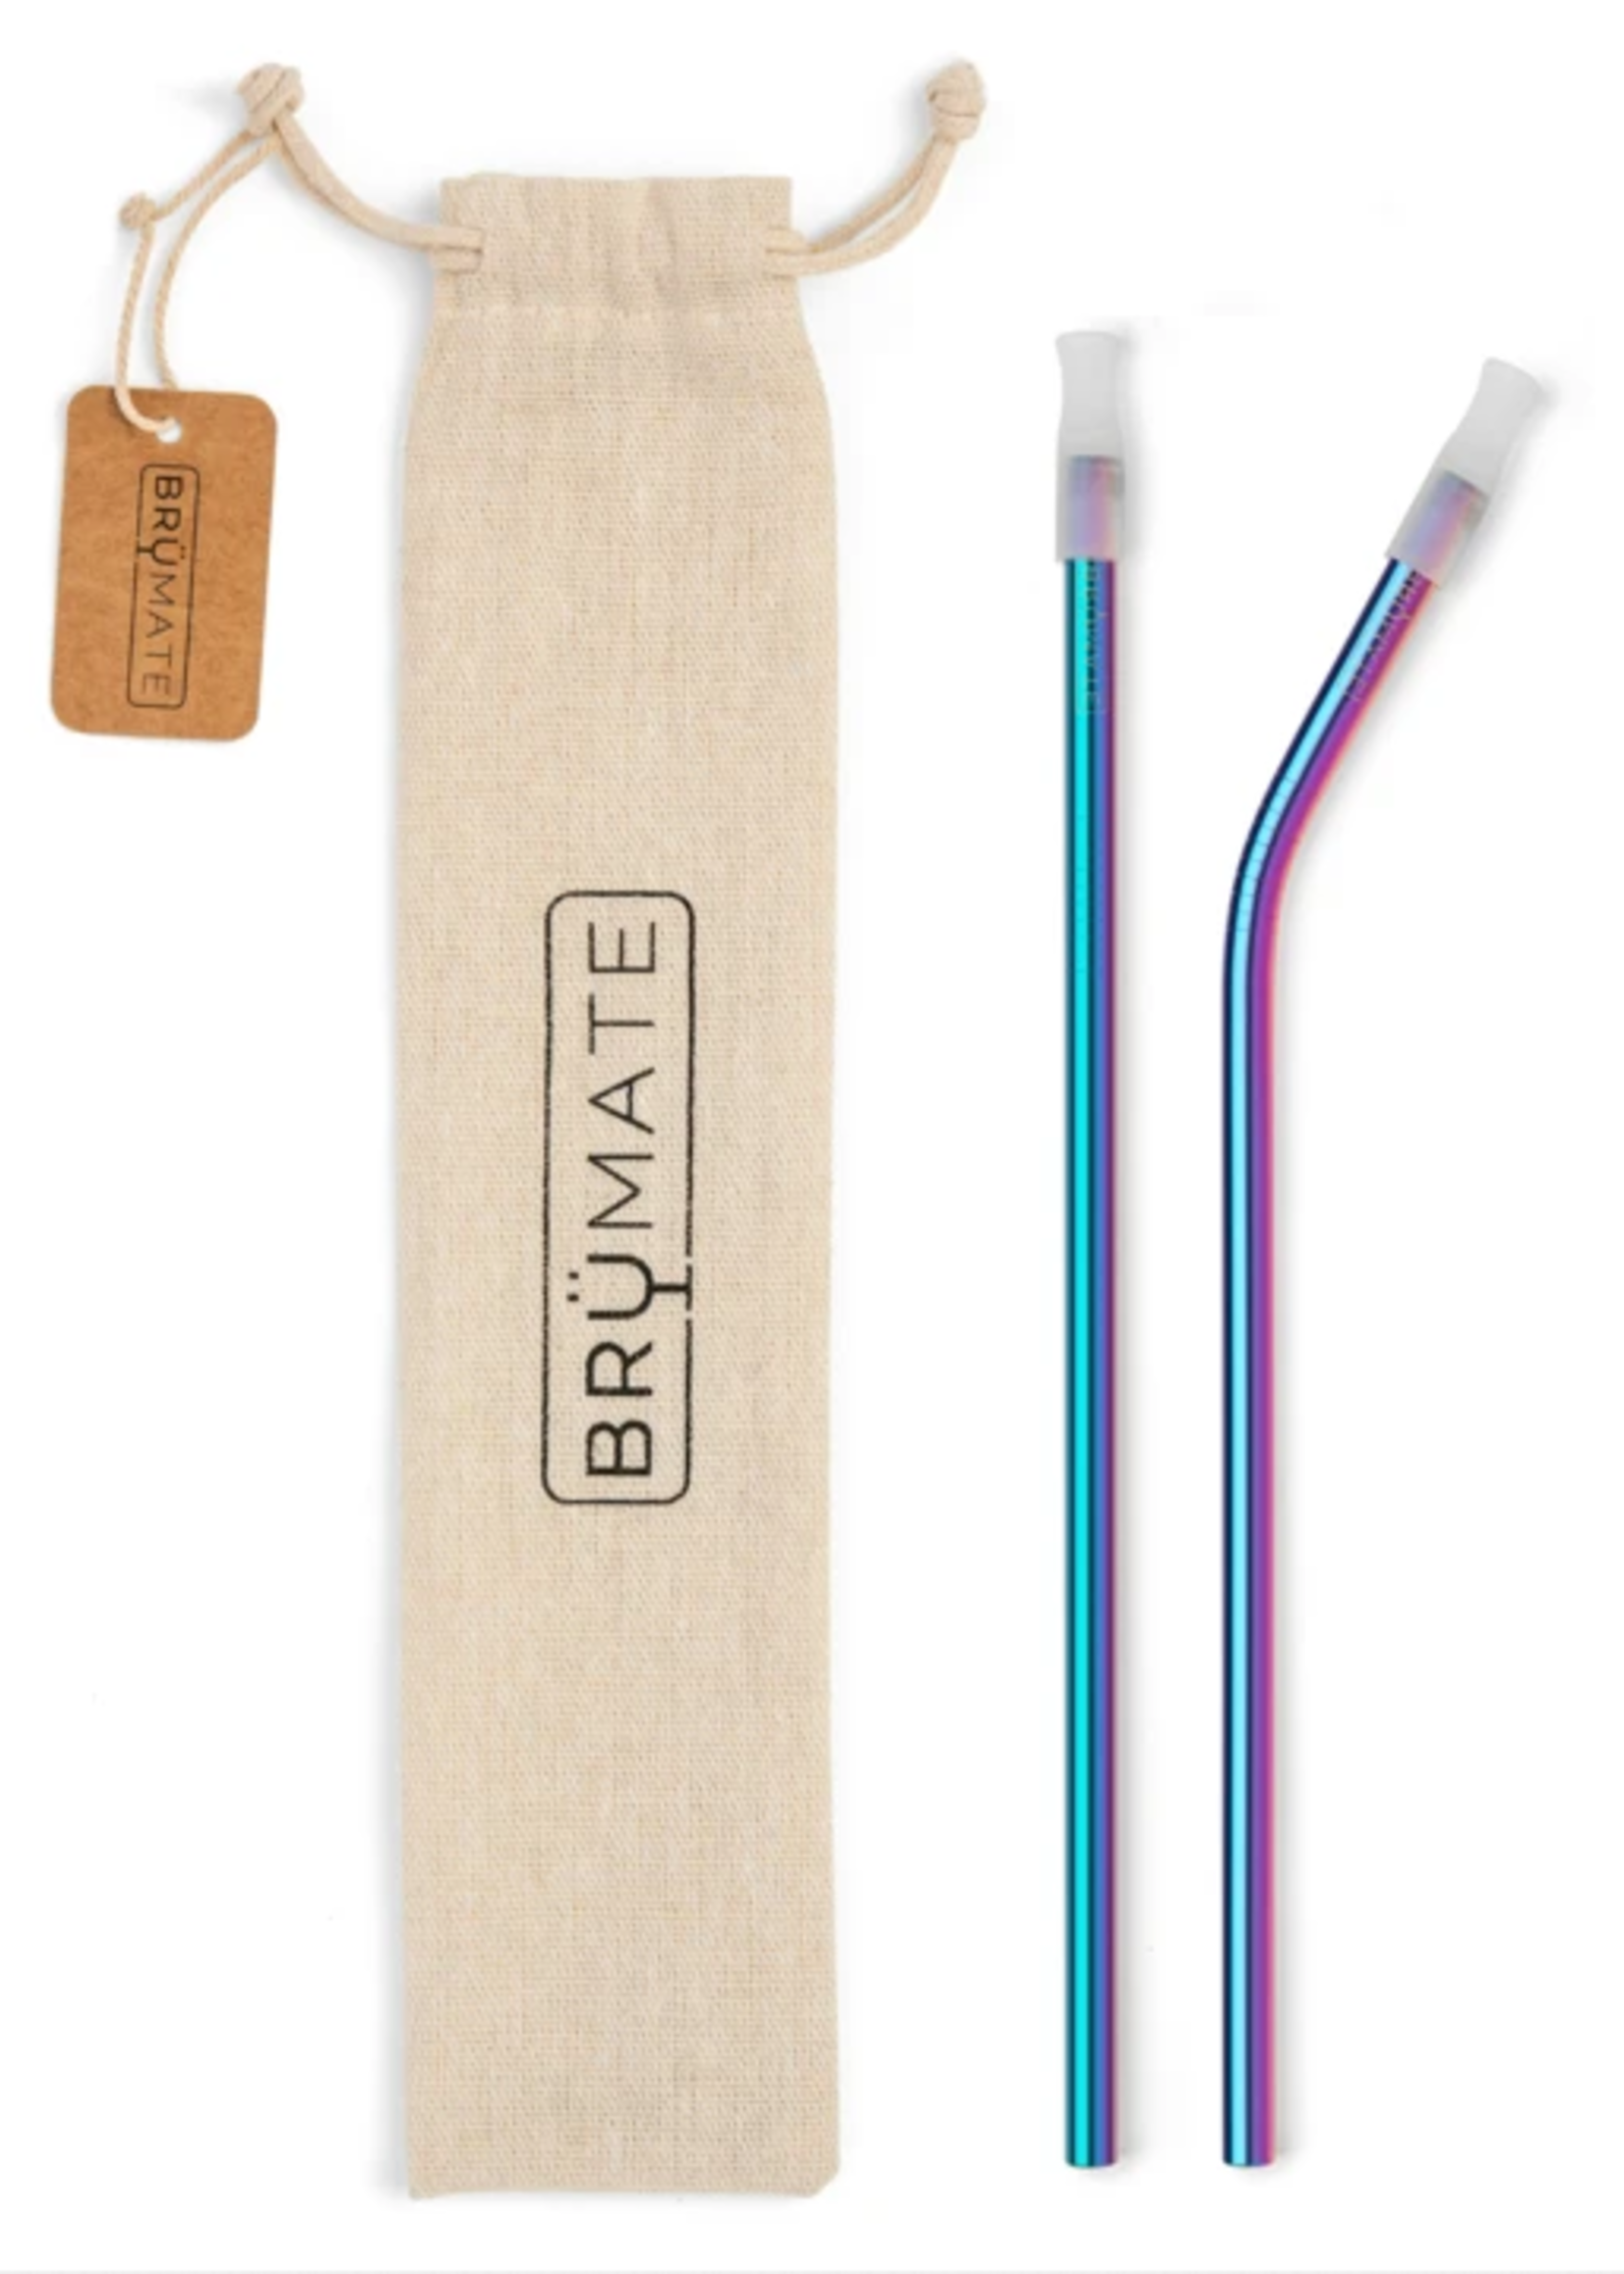 Brumate Stainless Steel Reusable Straw - Rainbow Titanium